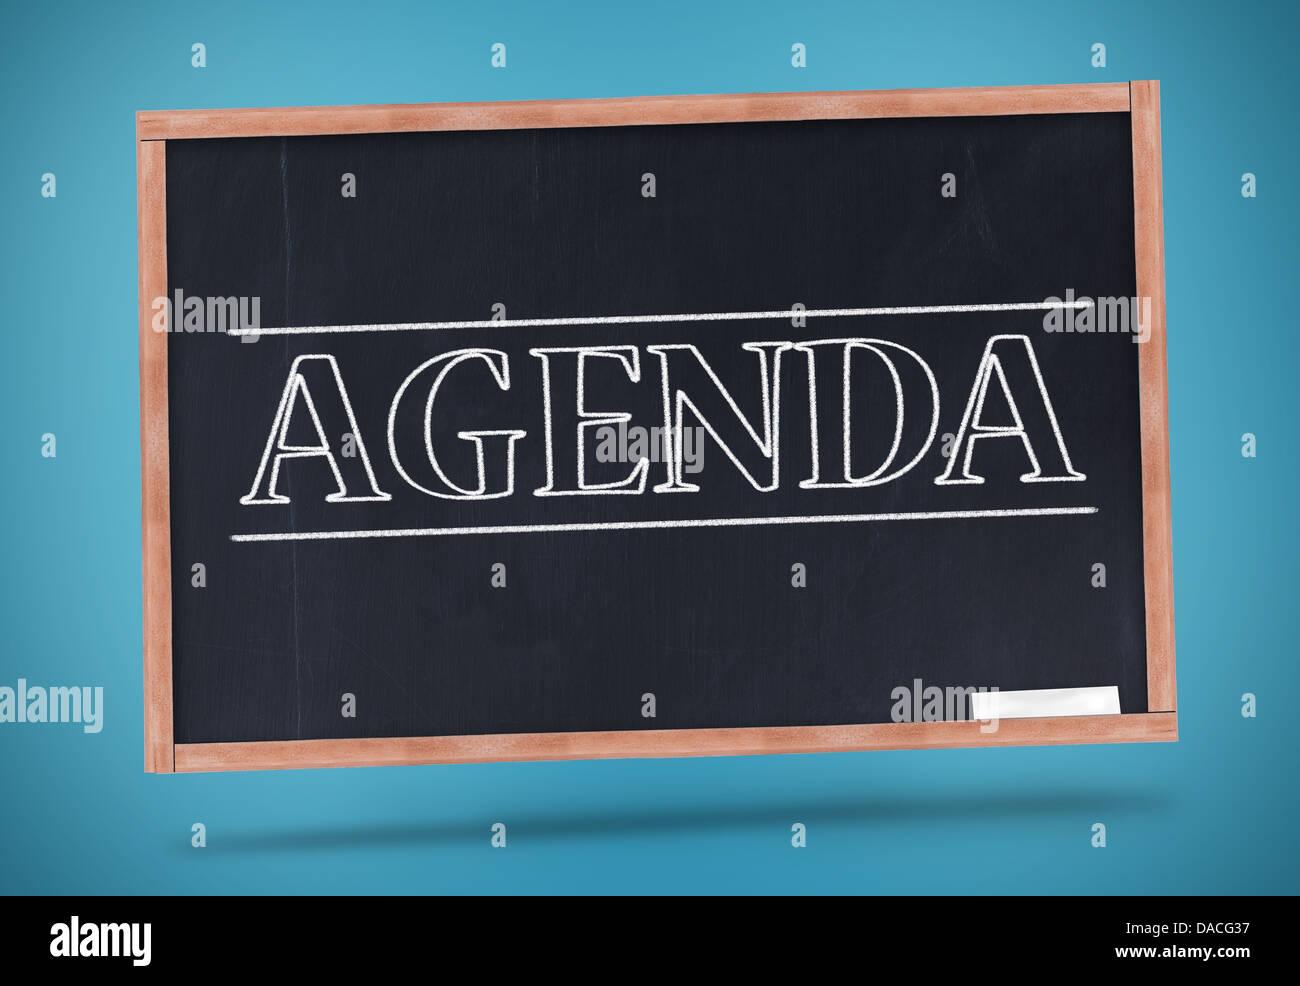 Agenda written in big capital letters - Stock Image